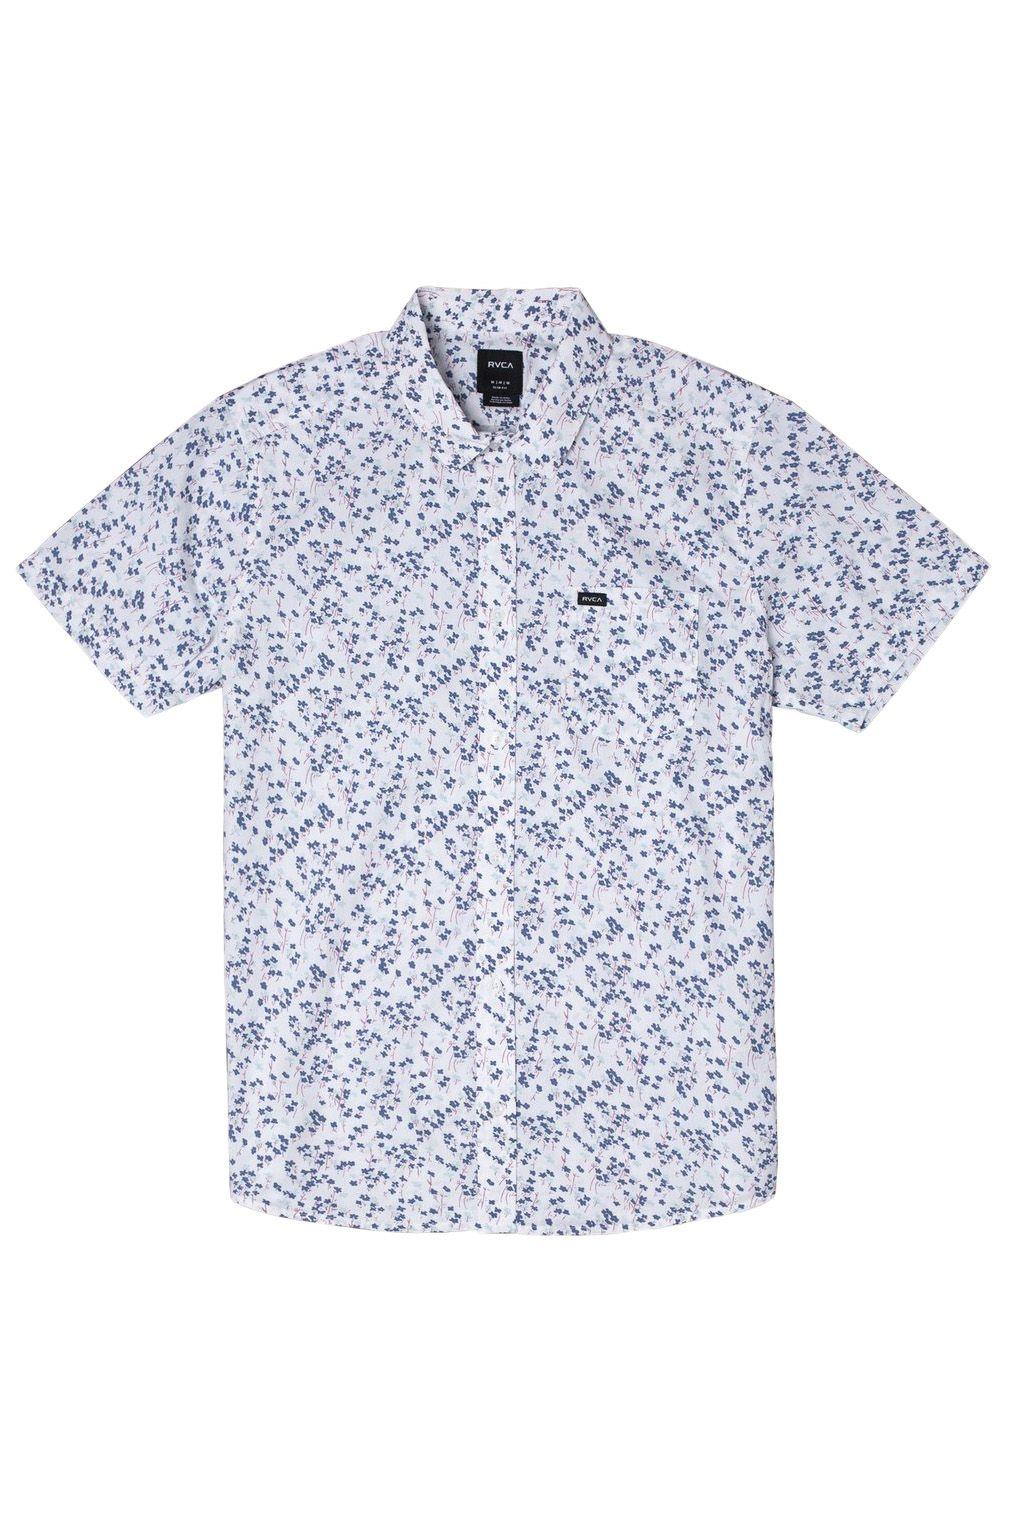 Camisa RVCA ETERNAL SS Antique White